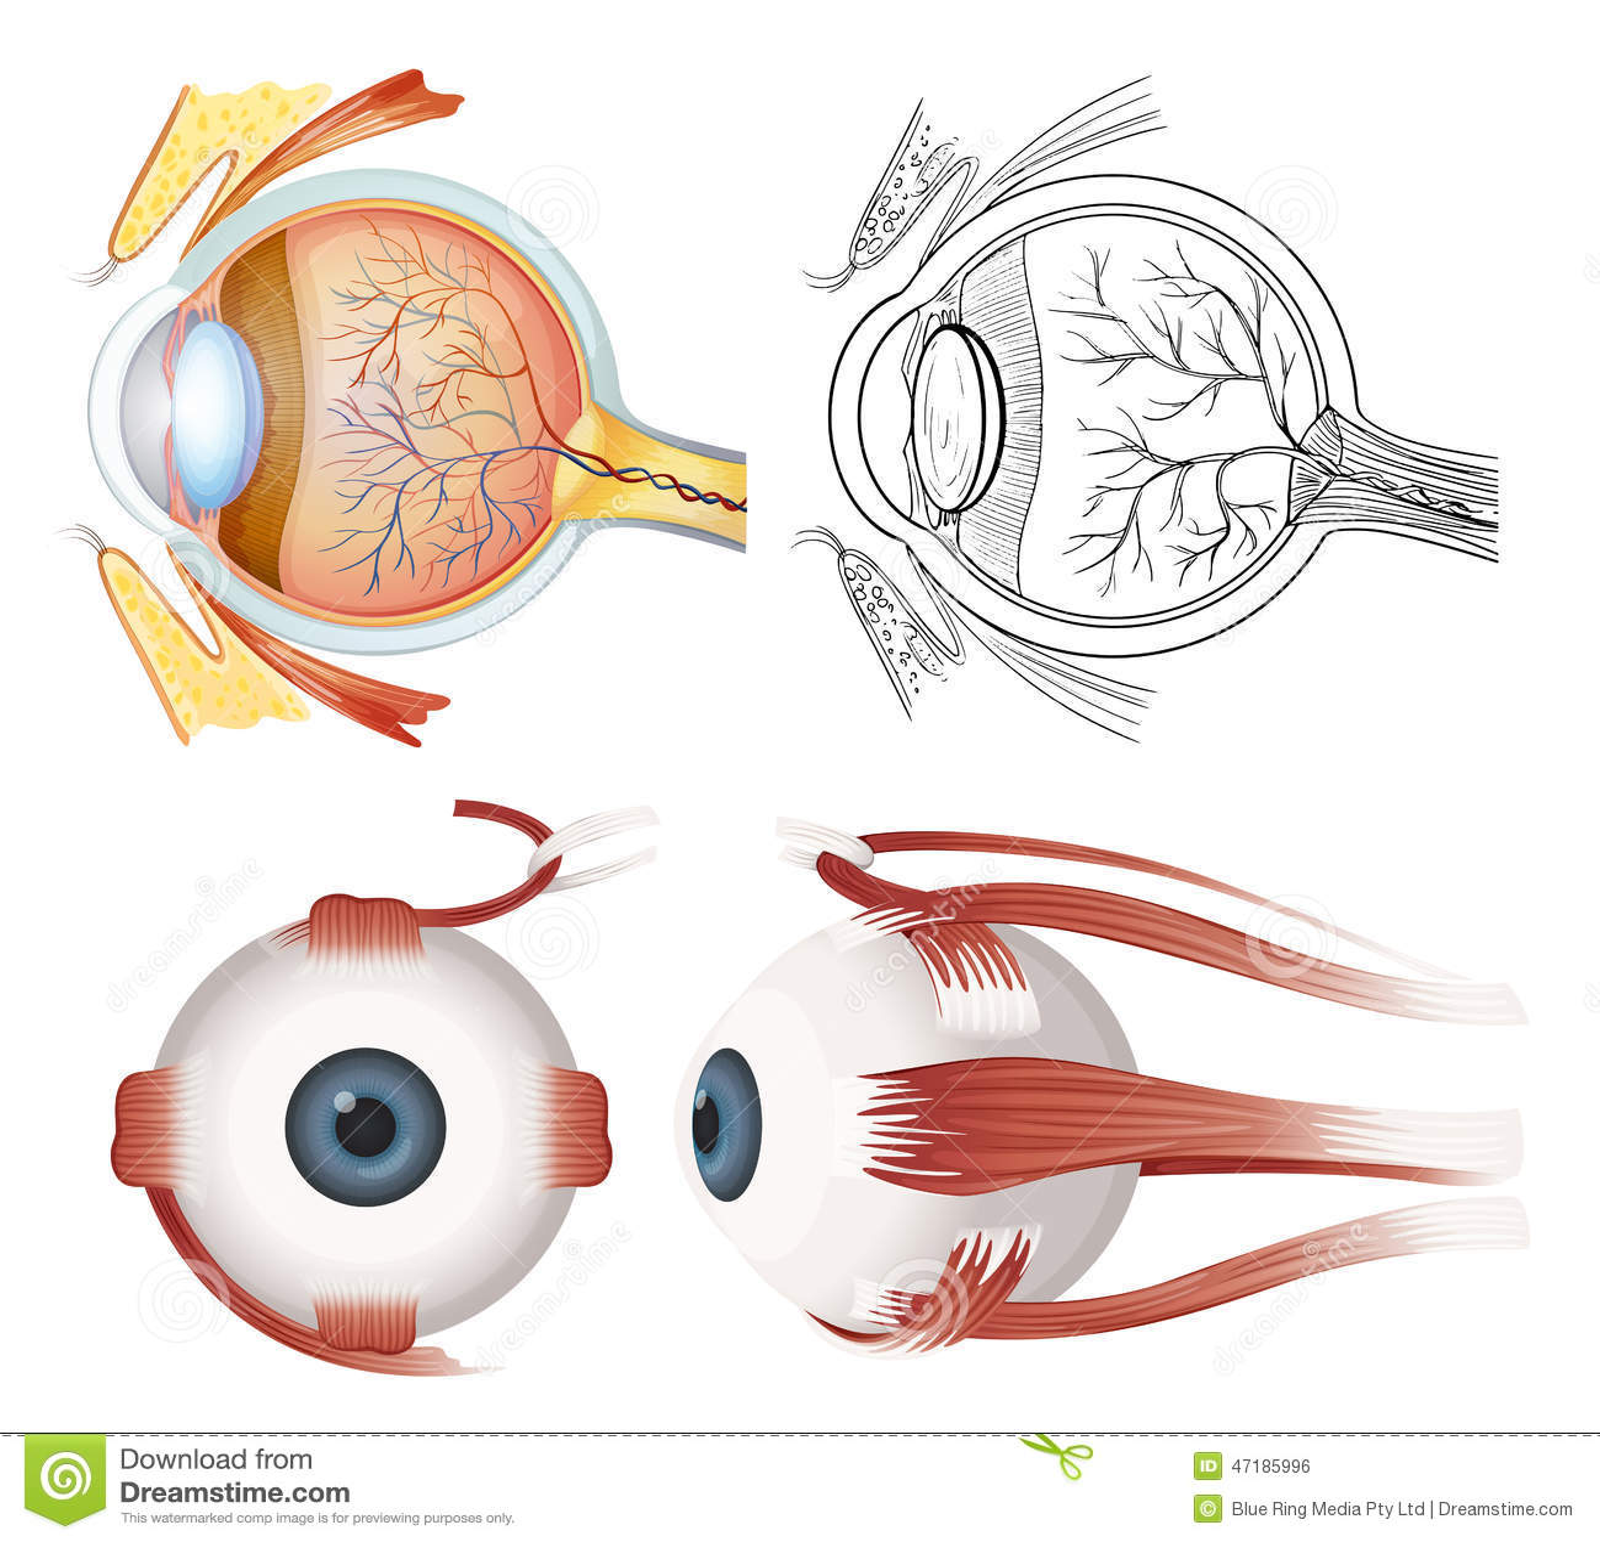 Anatomy Of The Eye Stock Vector Illustration Of Anatomy 47185996